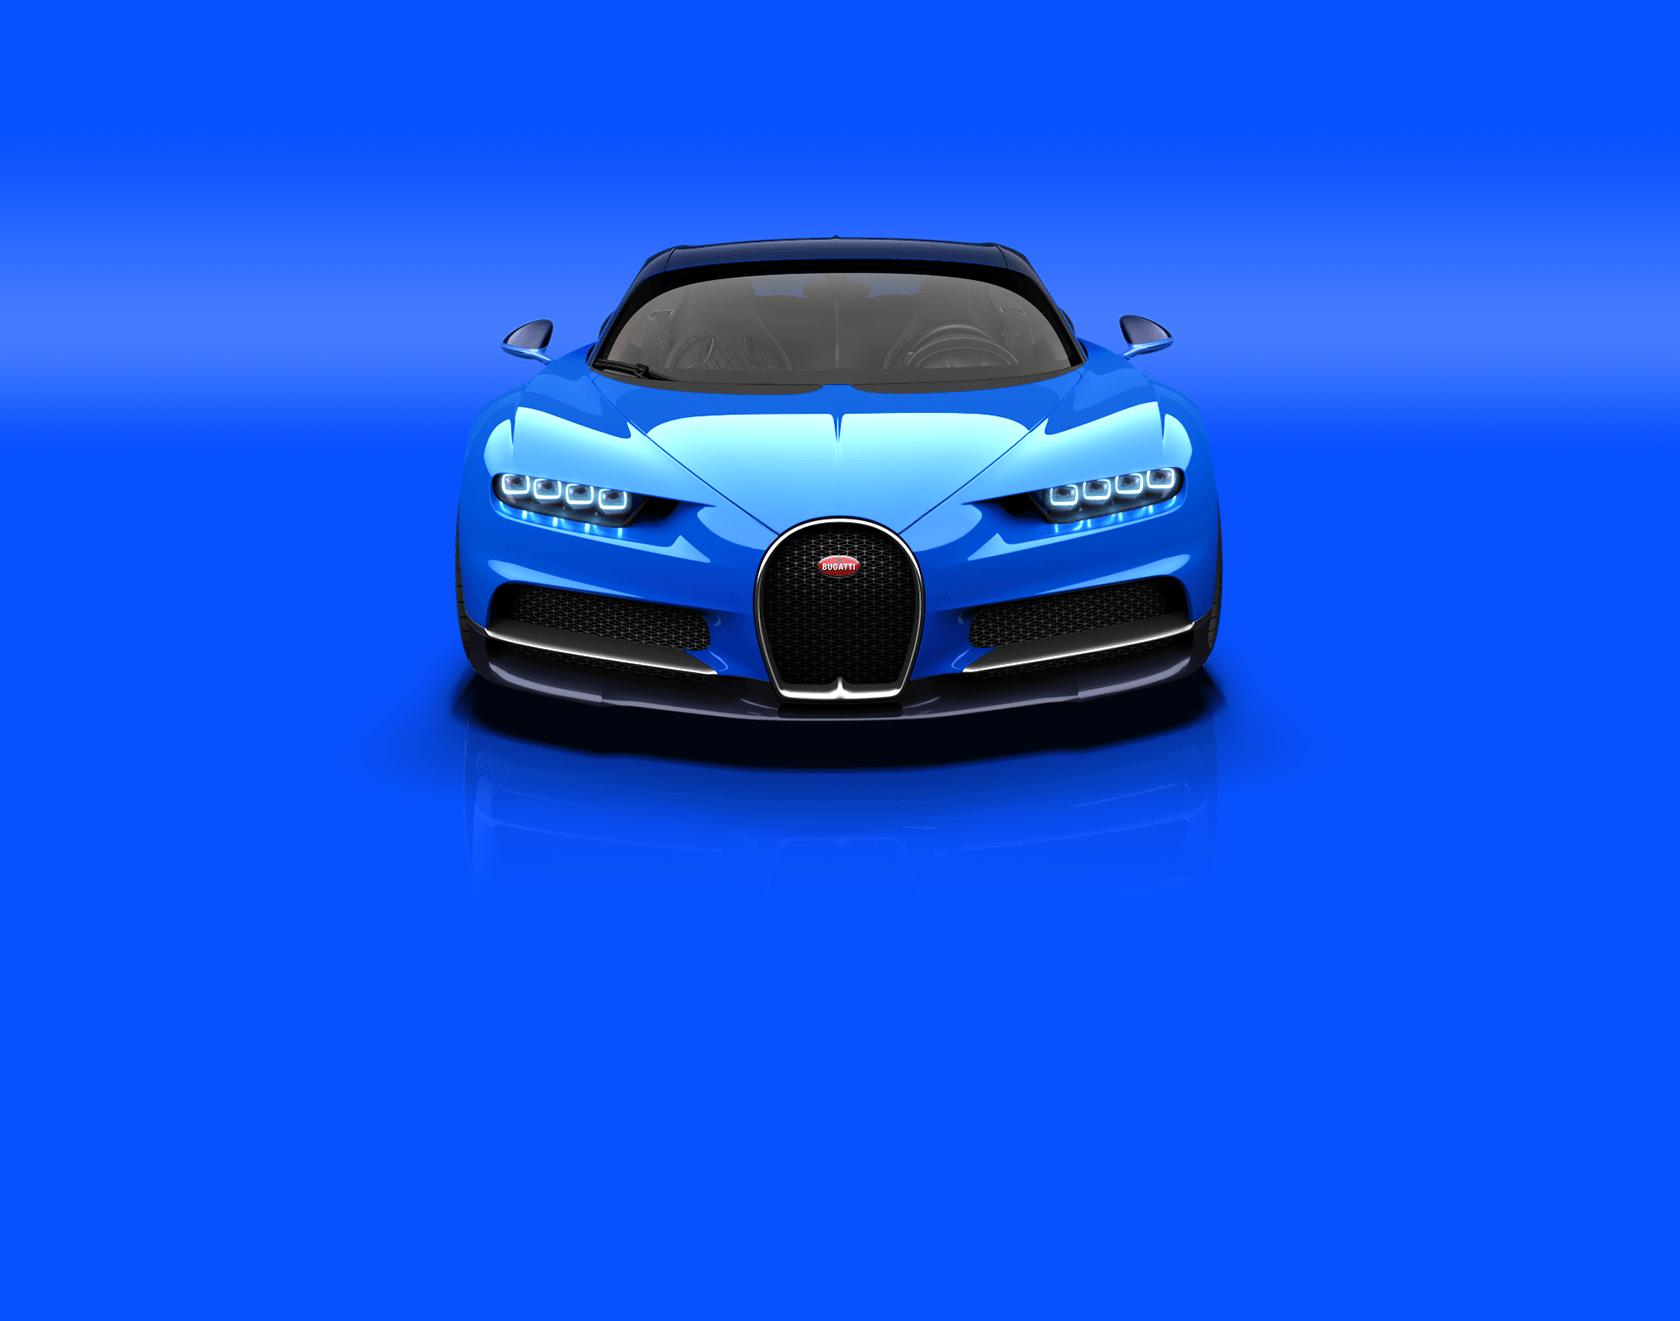 Bugatti Blue Wallpapers Top Free Bugatti Blue Backgrounds Wallpaperaccess